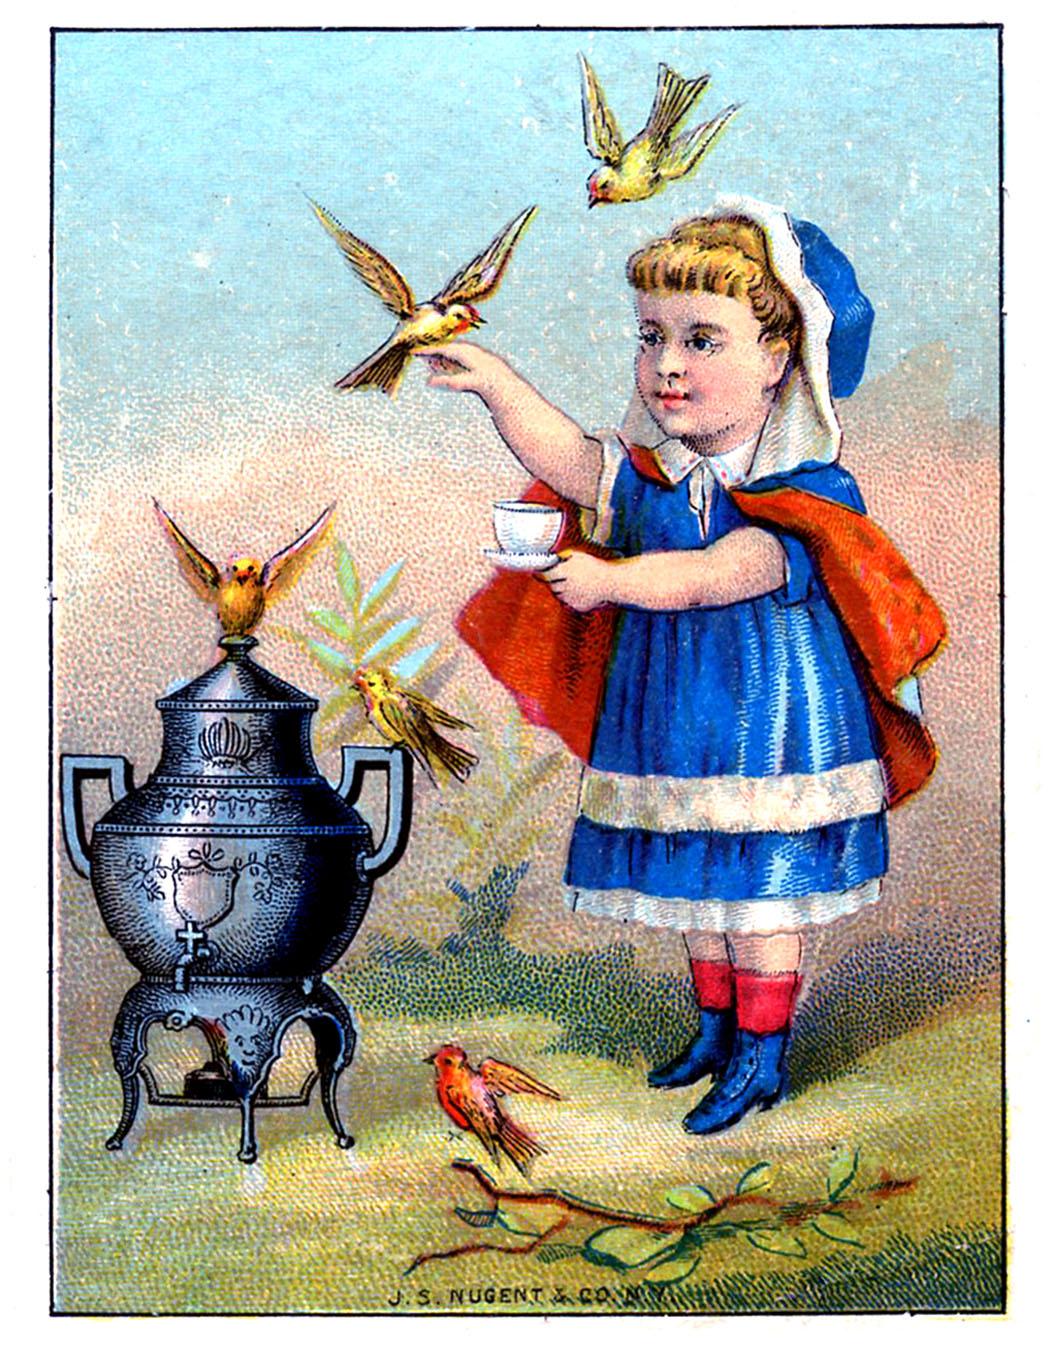 tea+girl+vintage+image+graphicsfairy006